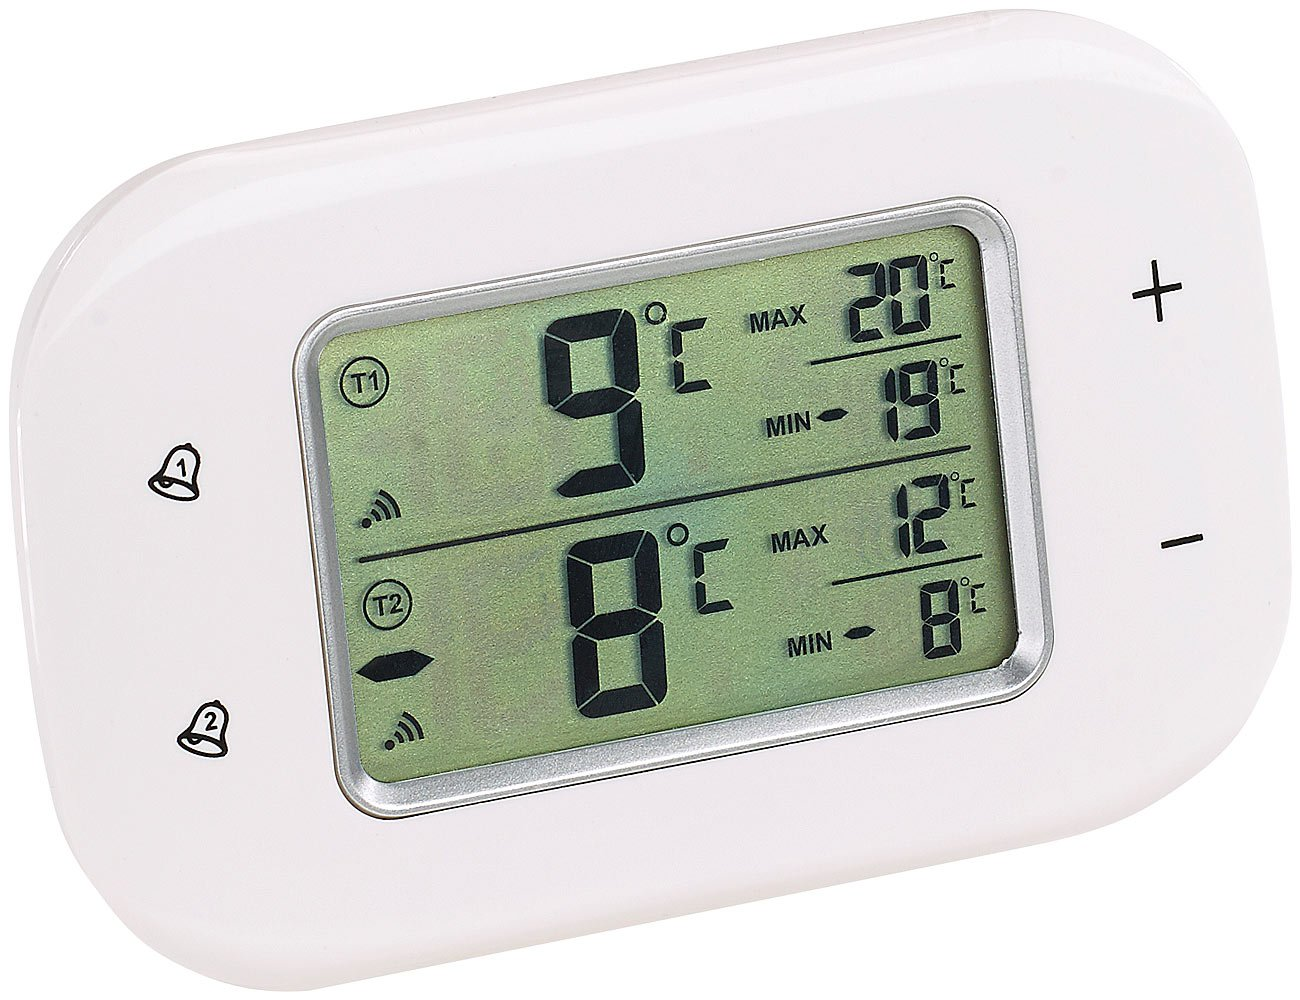 Kühlschrank Tür Alarm : Amazon rosenstein söhne kühlschrankthermometer digitales